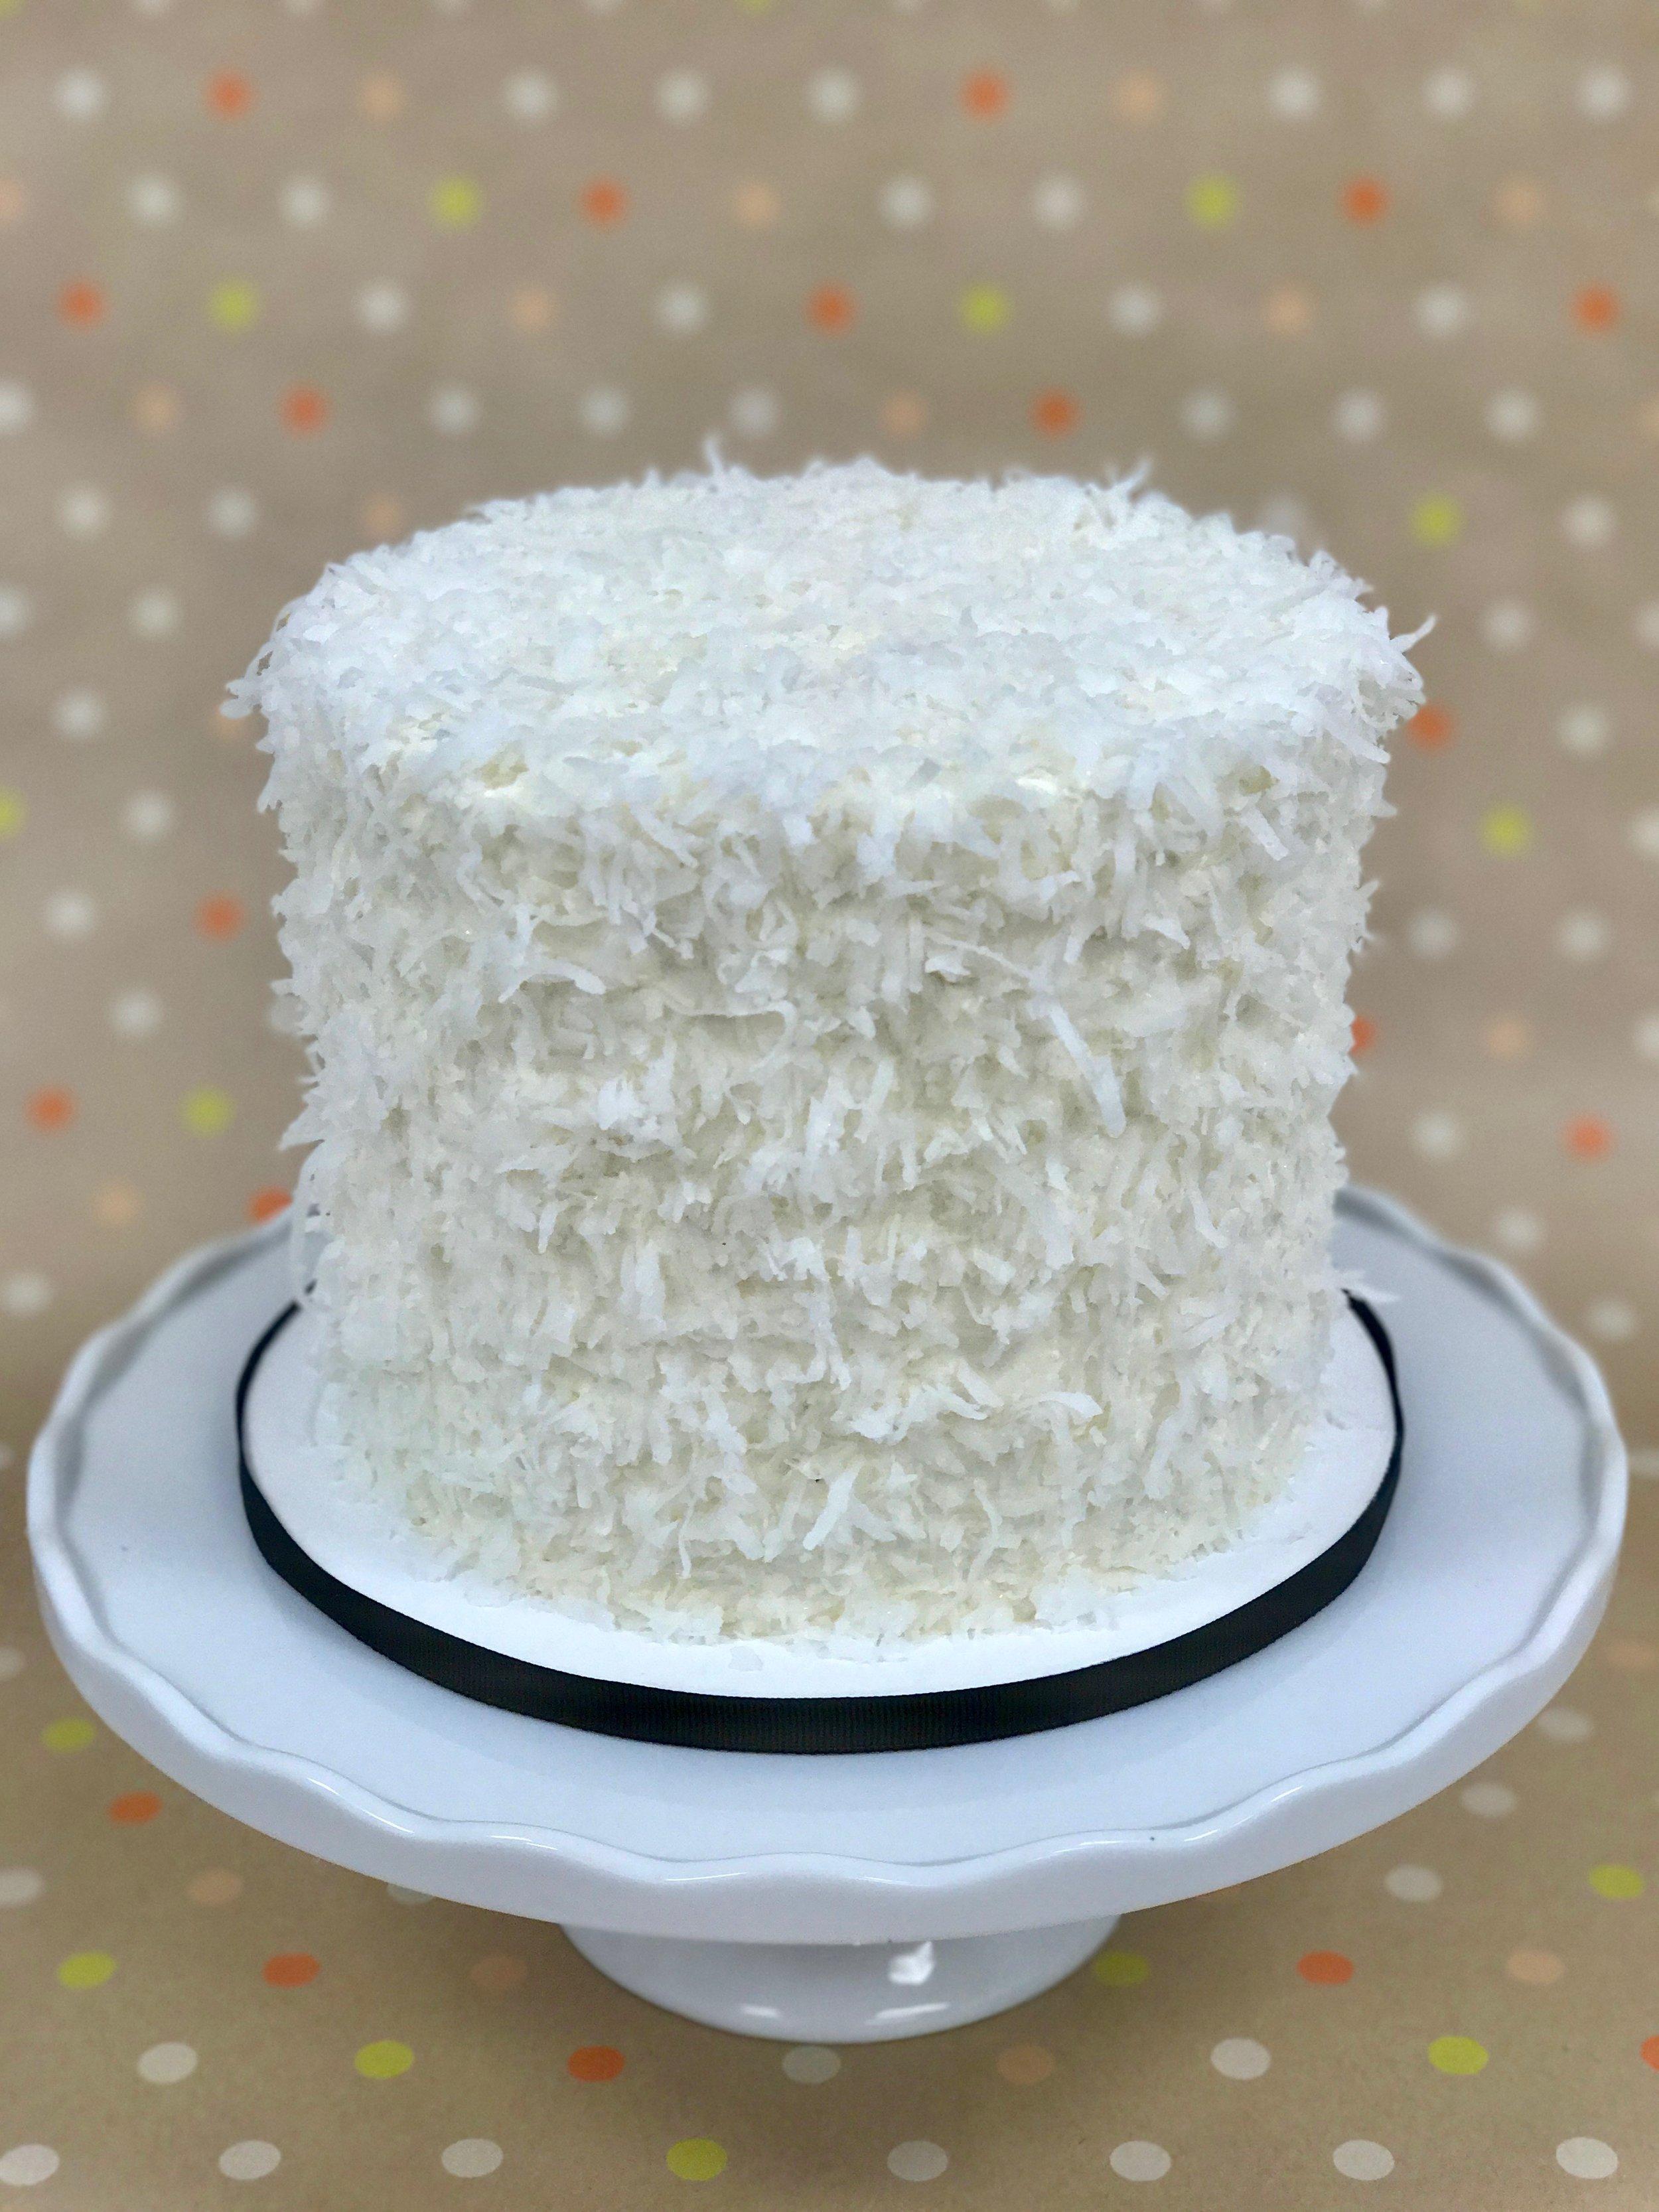 Coconut - Cake: CoconutFilling: Vanilla Cream CheeseFrosting: Vanilla Swiss Meringue Buttercream and Shredded Coconut